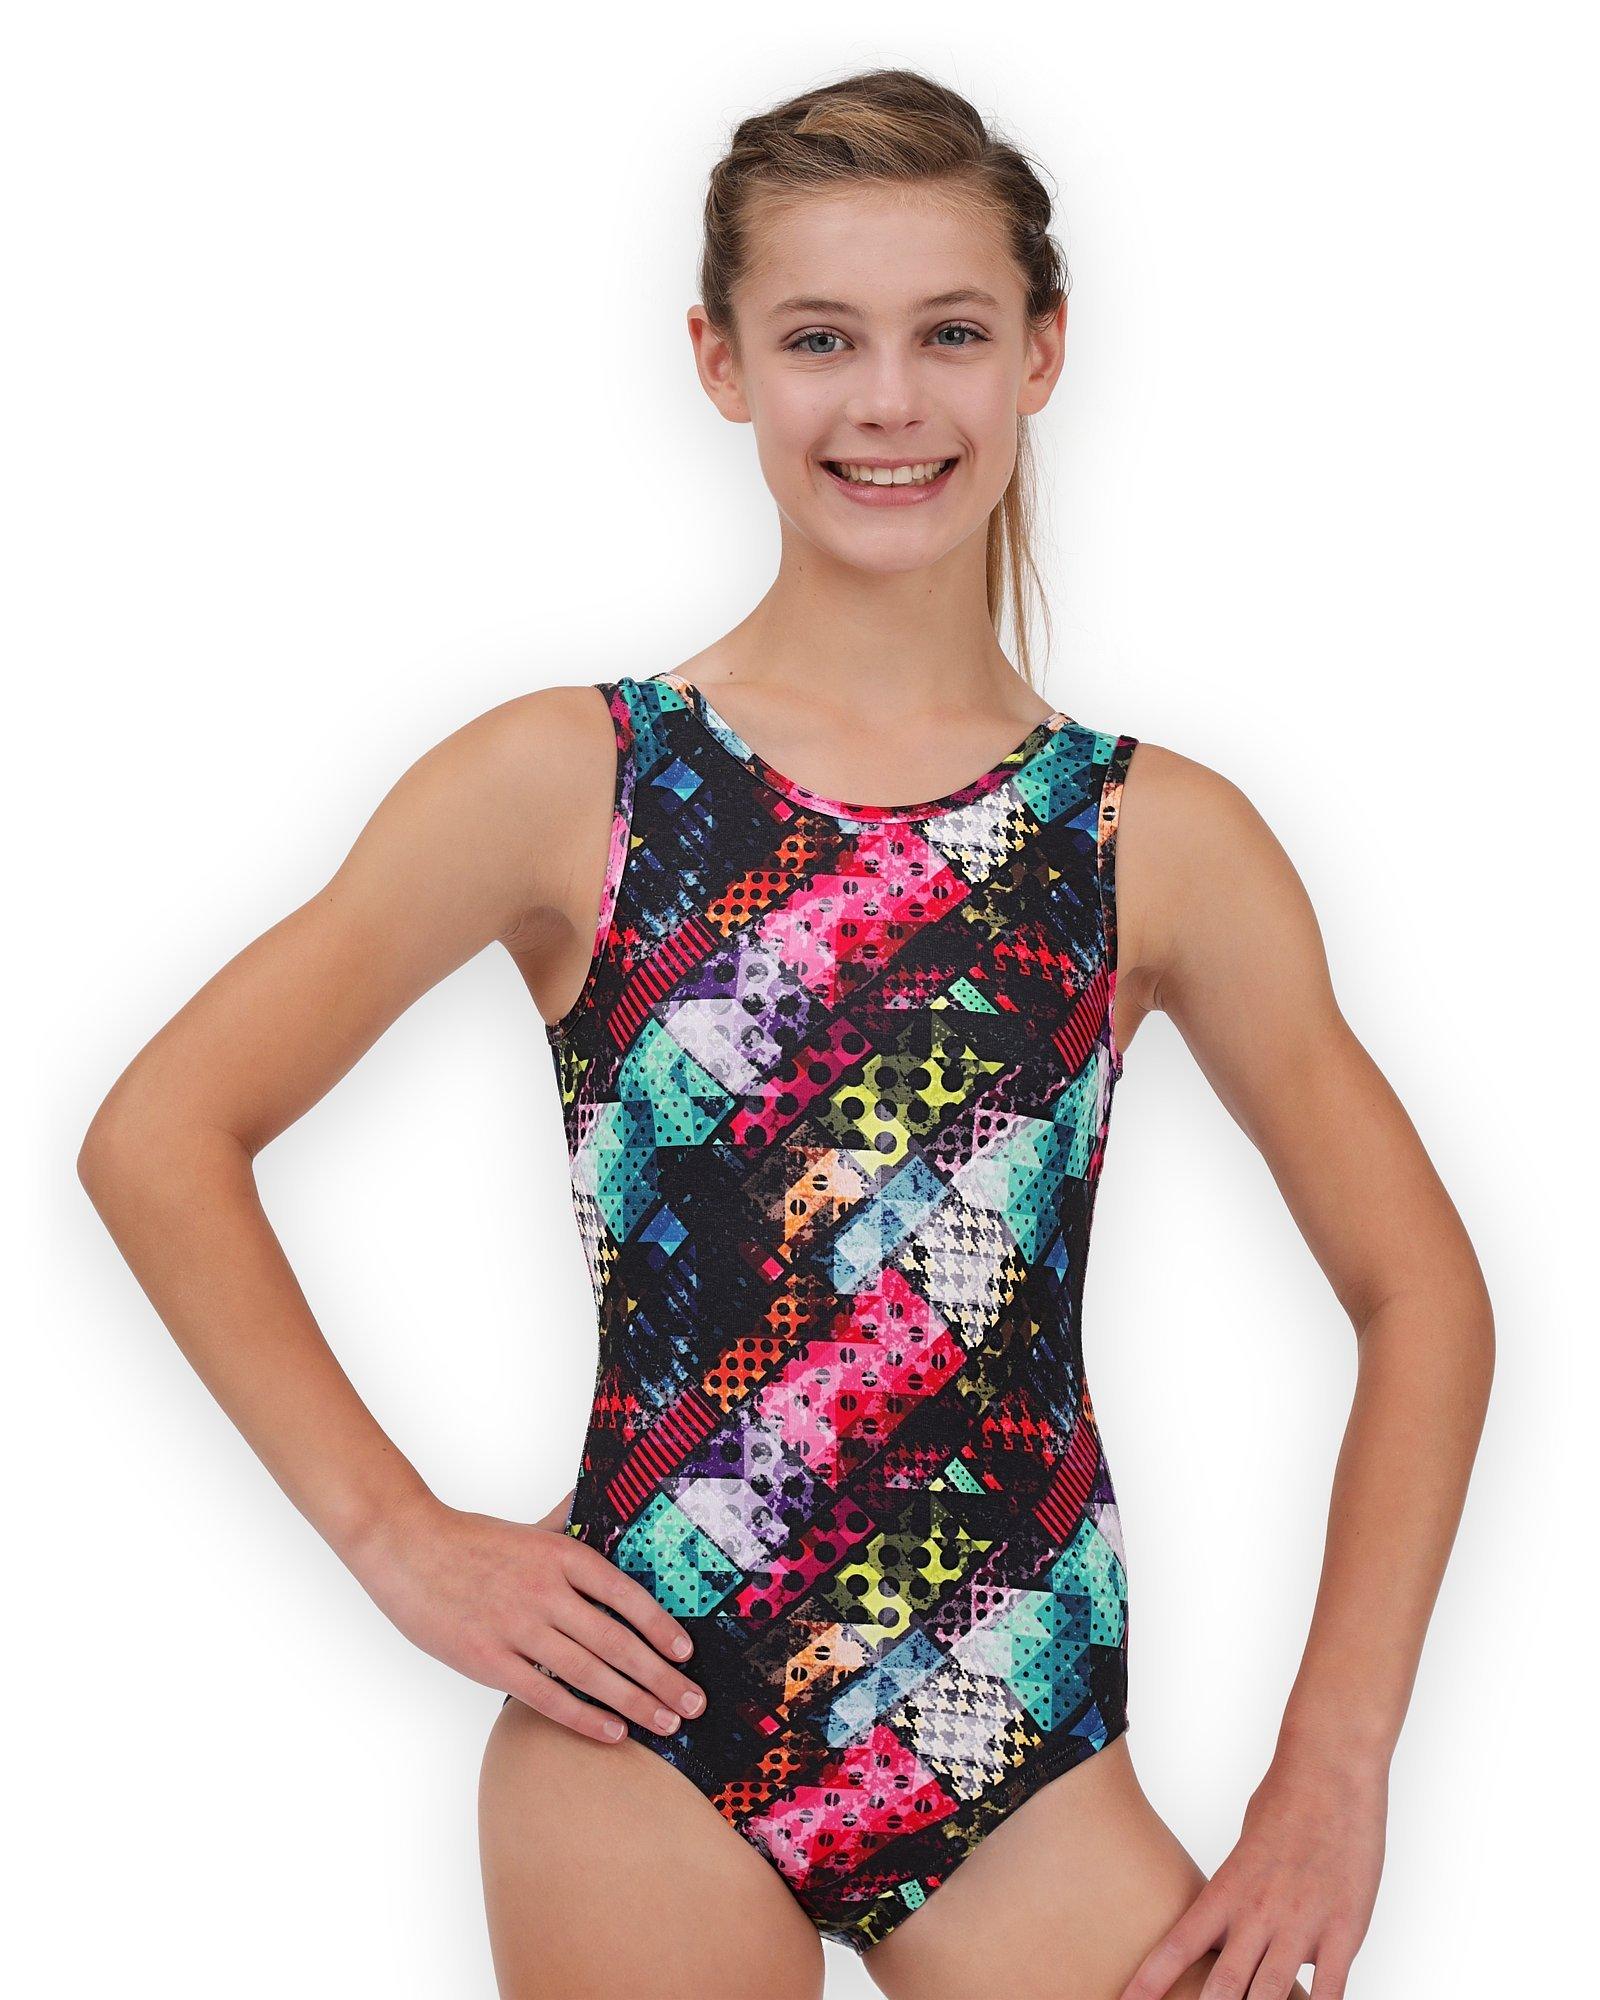 Pelle Gymnastics Leotard for Girls - Traffic - CL by Pelle (Image #1)